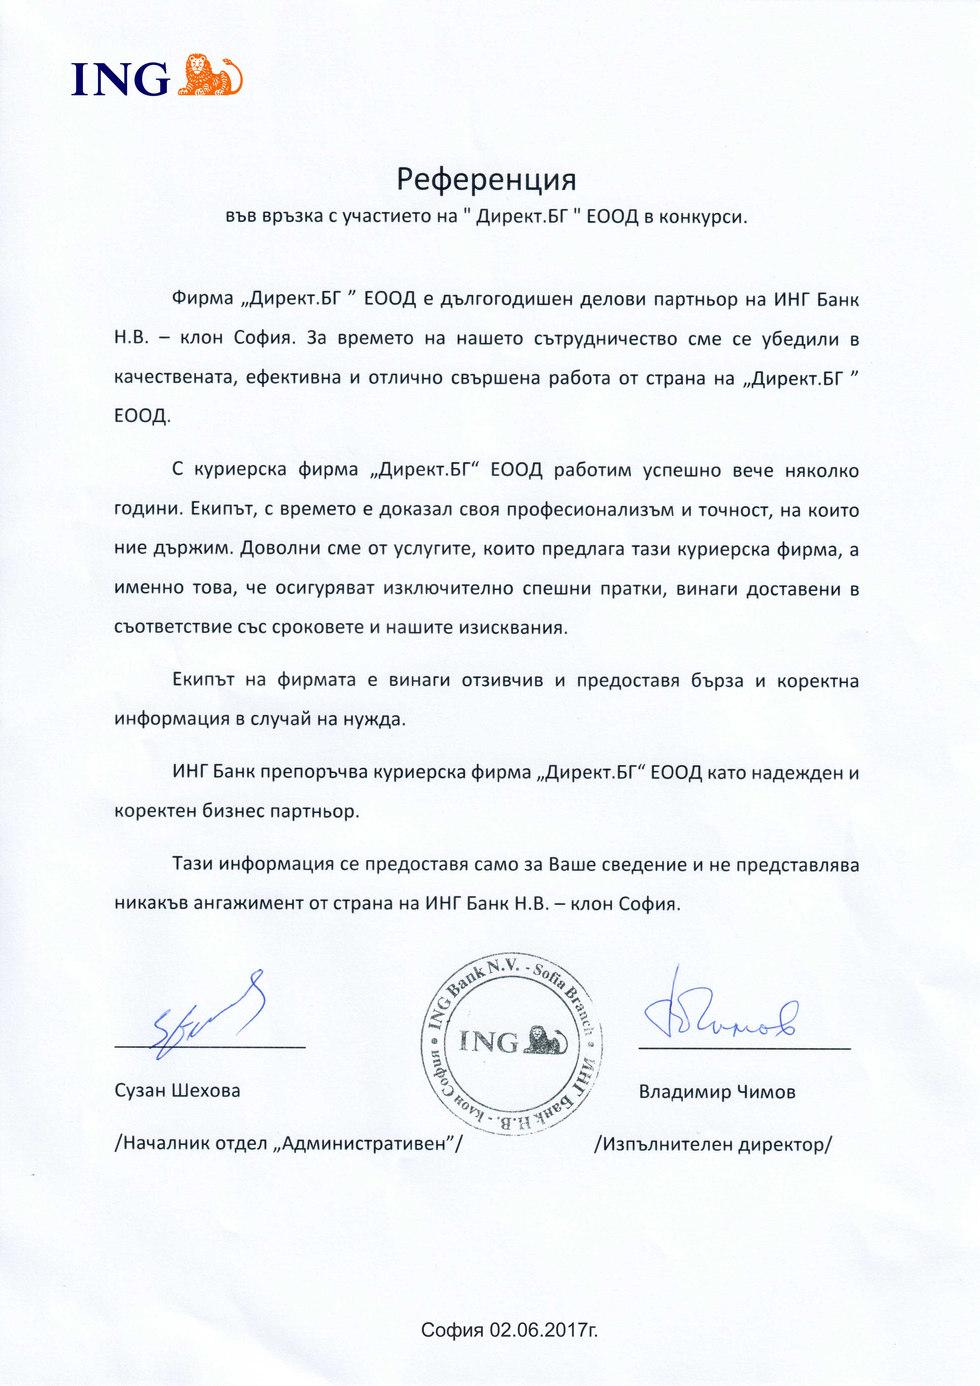 Референция от ИНГ Банк Н.В. - клон София